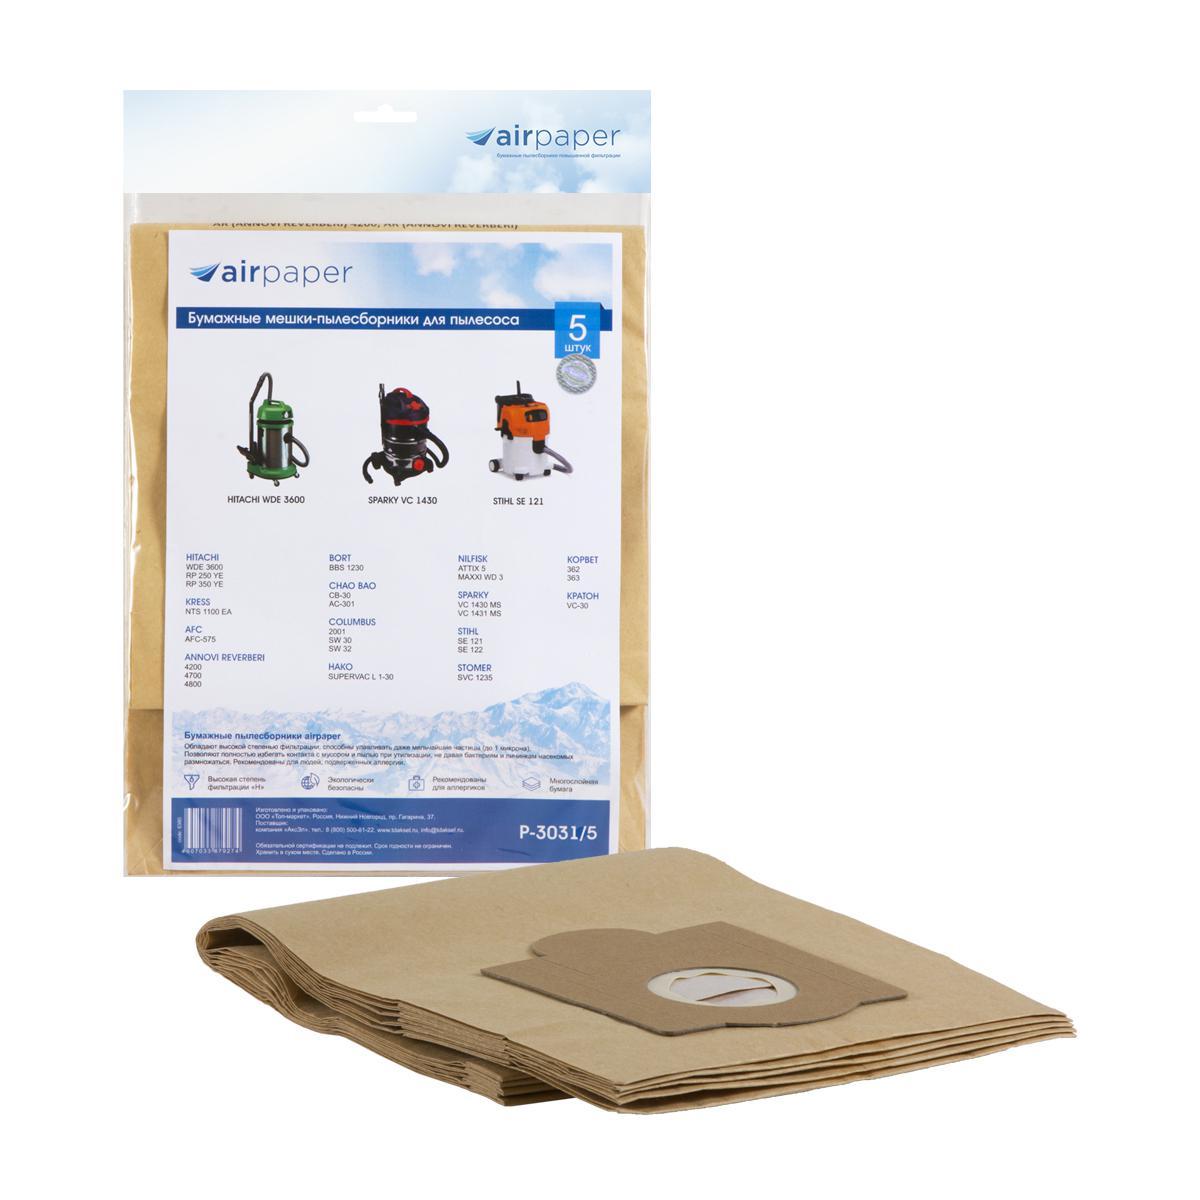 Мешок Air paper P-3031/5 5 шт./уп. мешок air paper p 3031